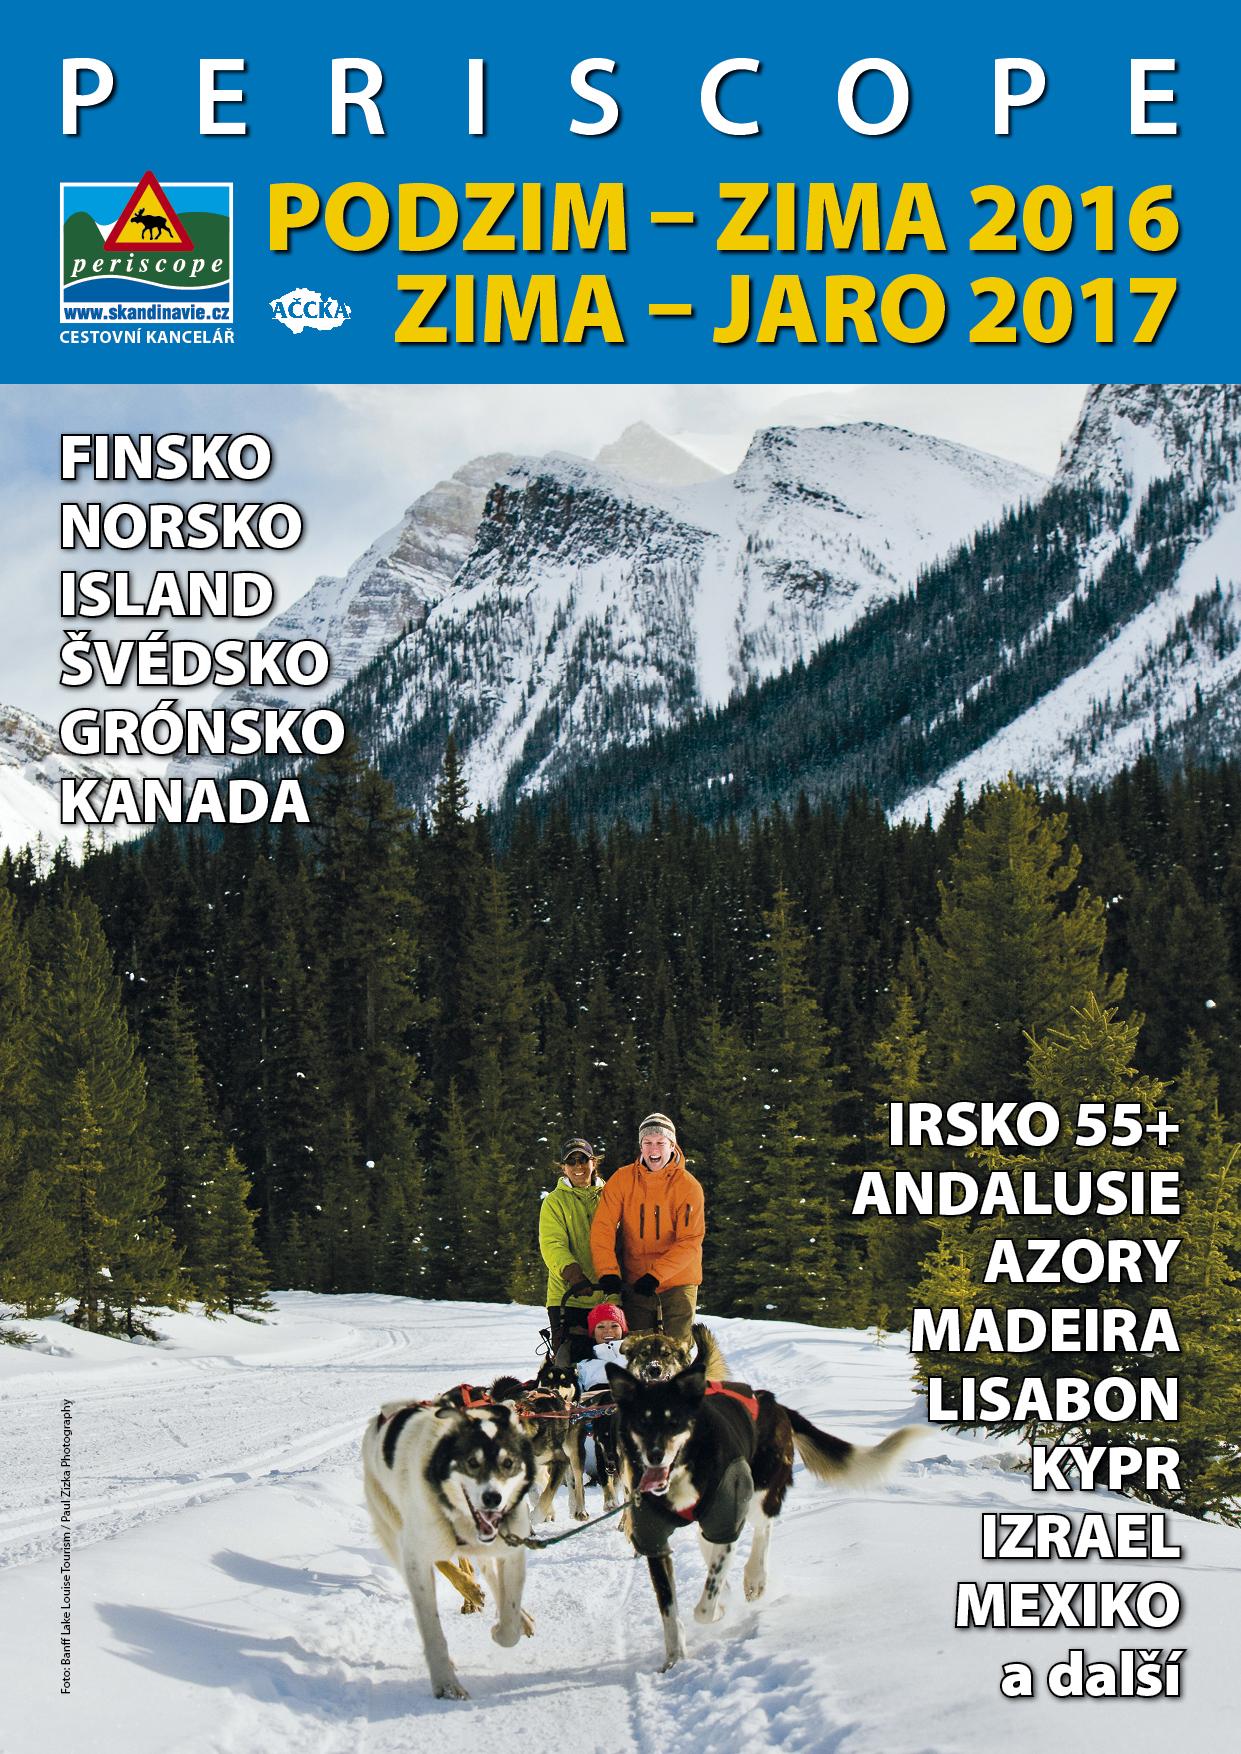 Redakce - Infoscope - zkatalogu / titulka katalog podzim zima jaro 2016 2017